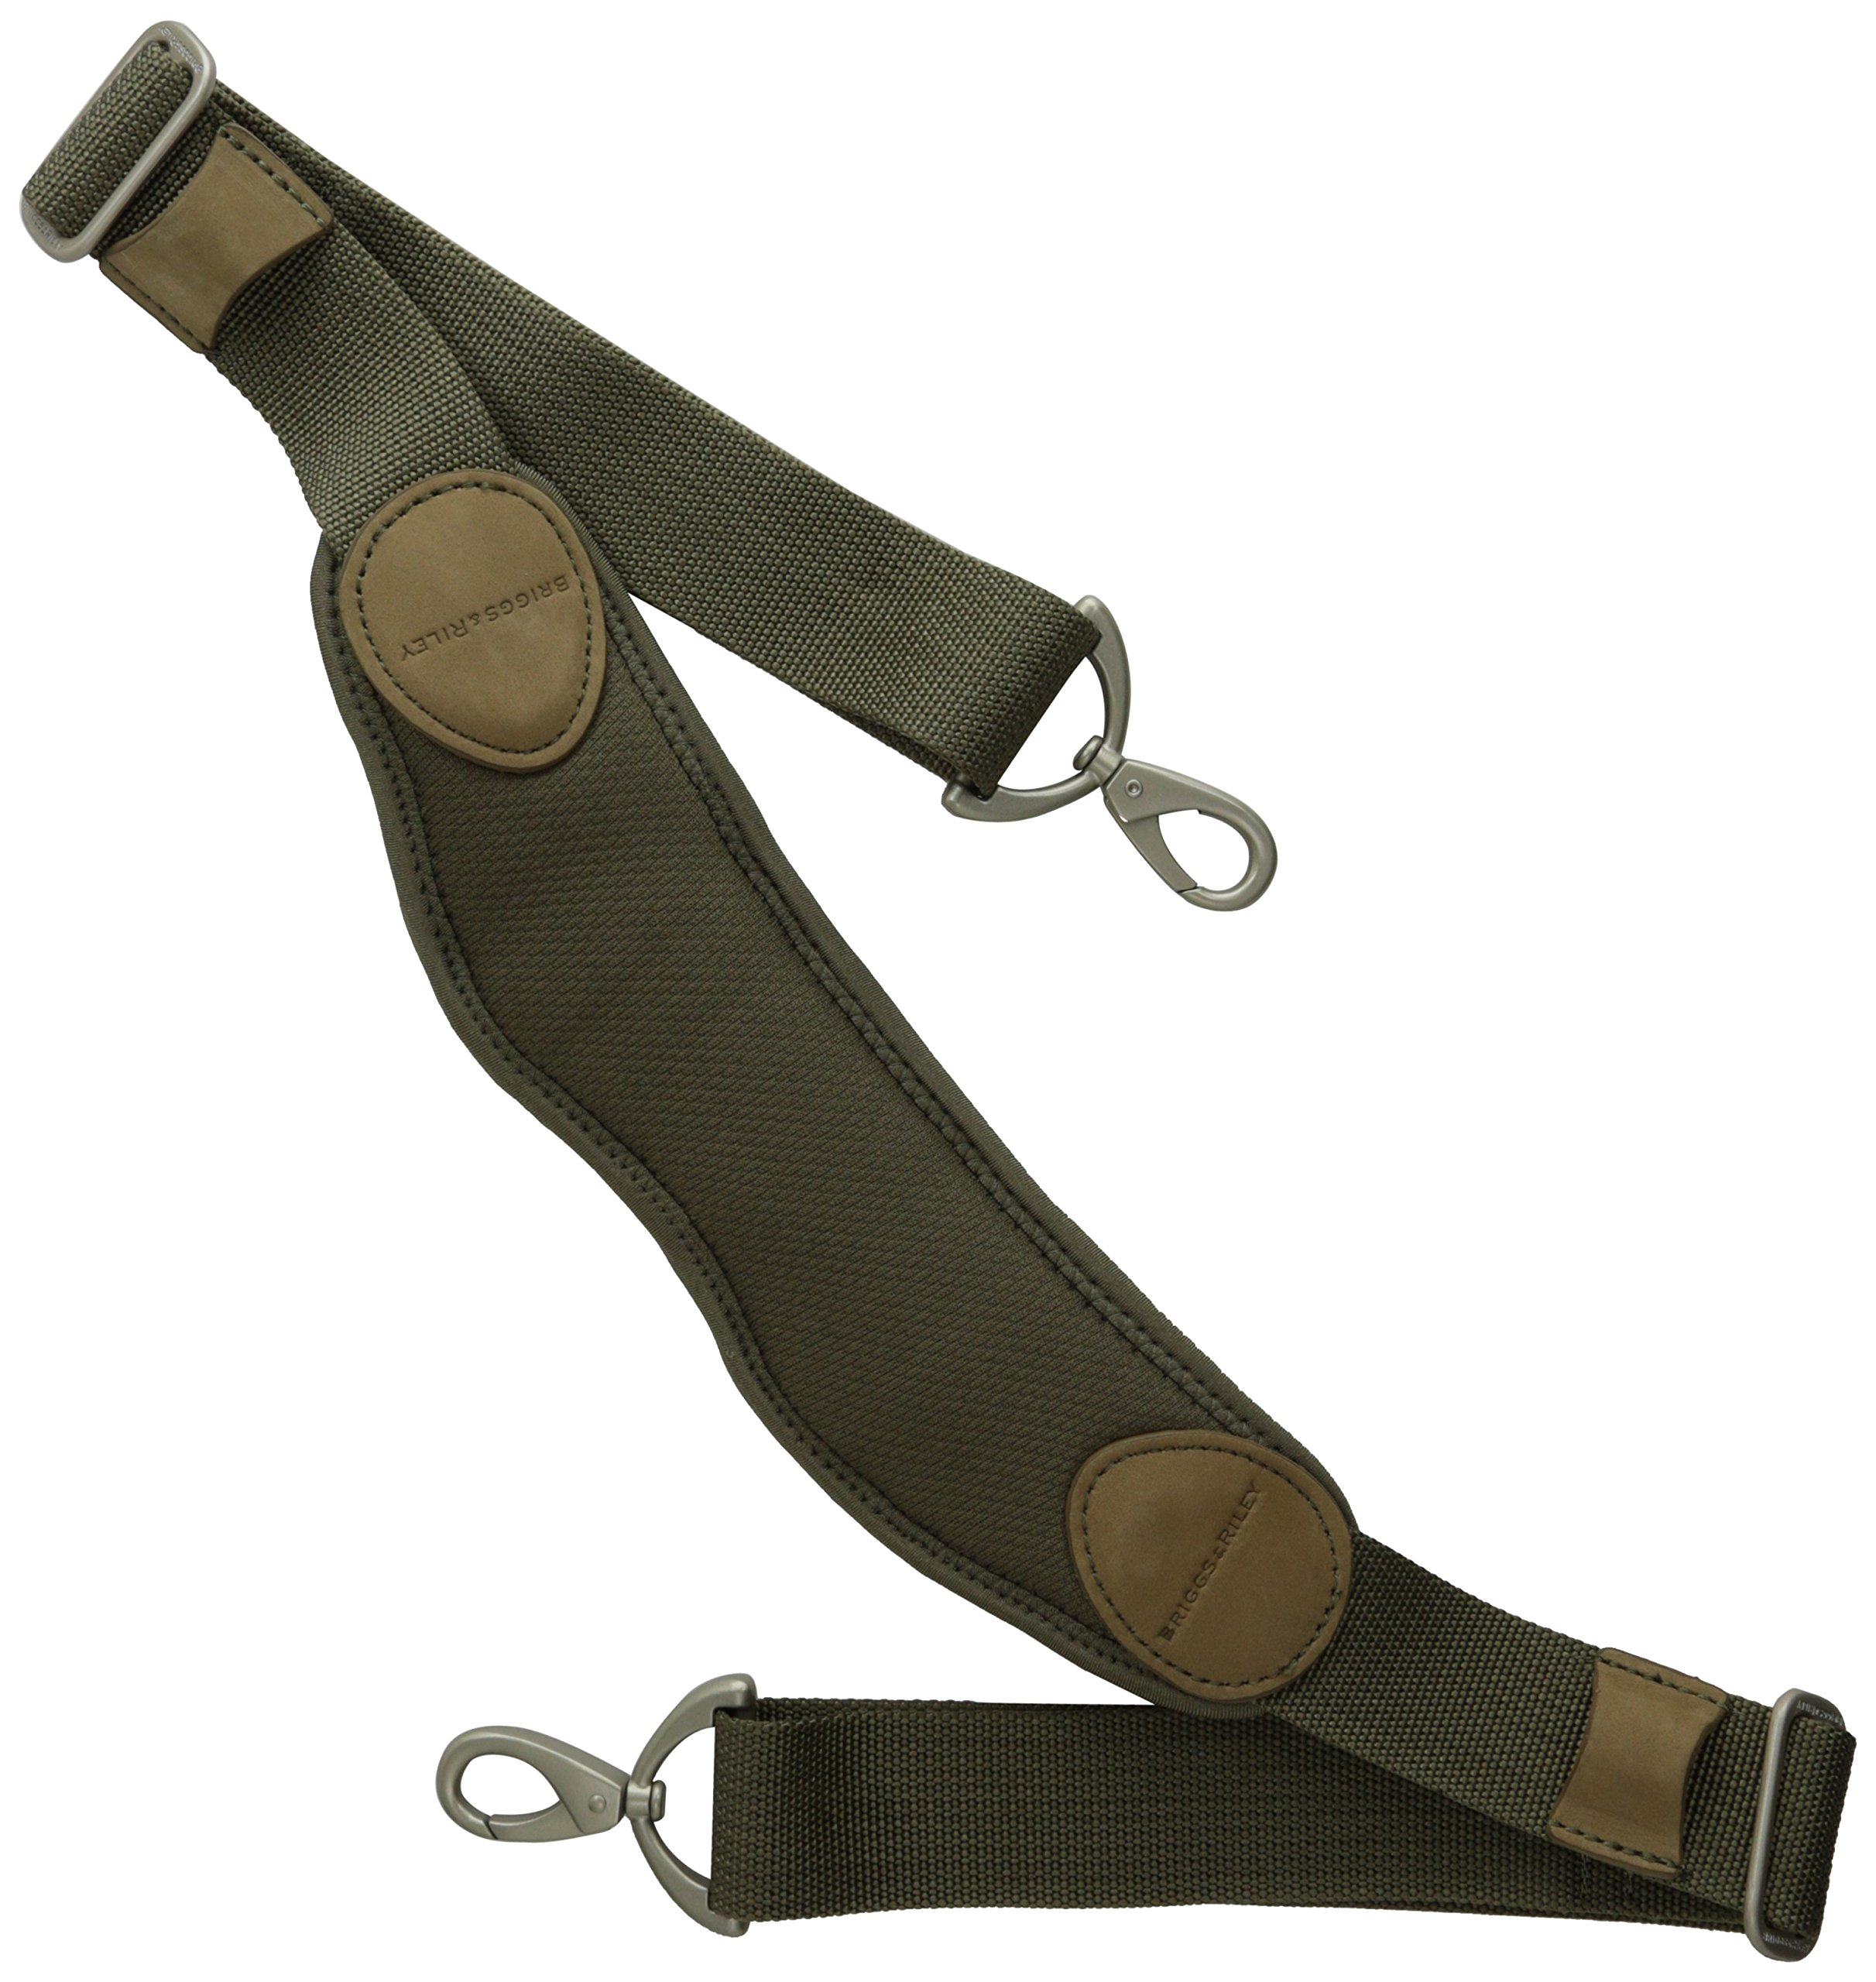 Briggs & Riley Flexible Shoulder Strap, Olive, One Size